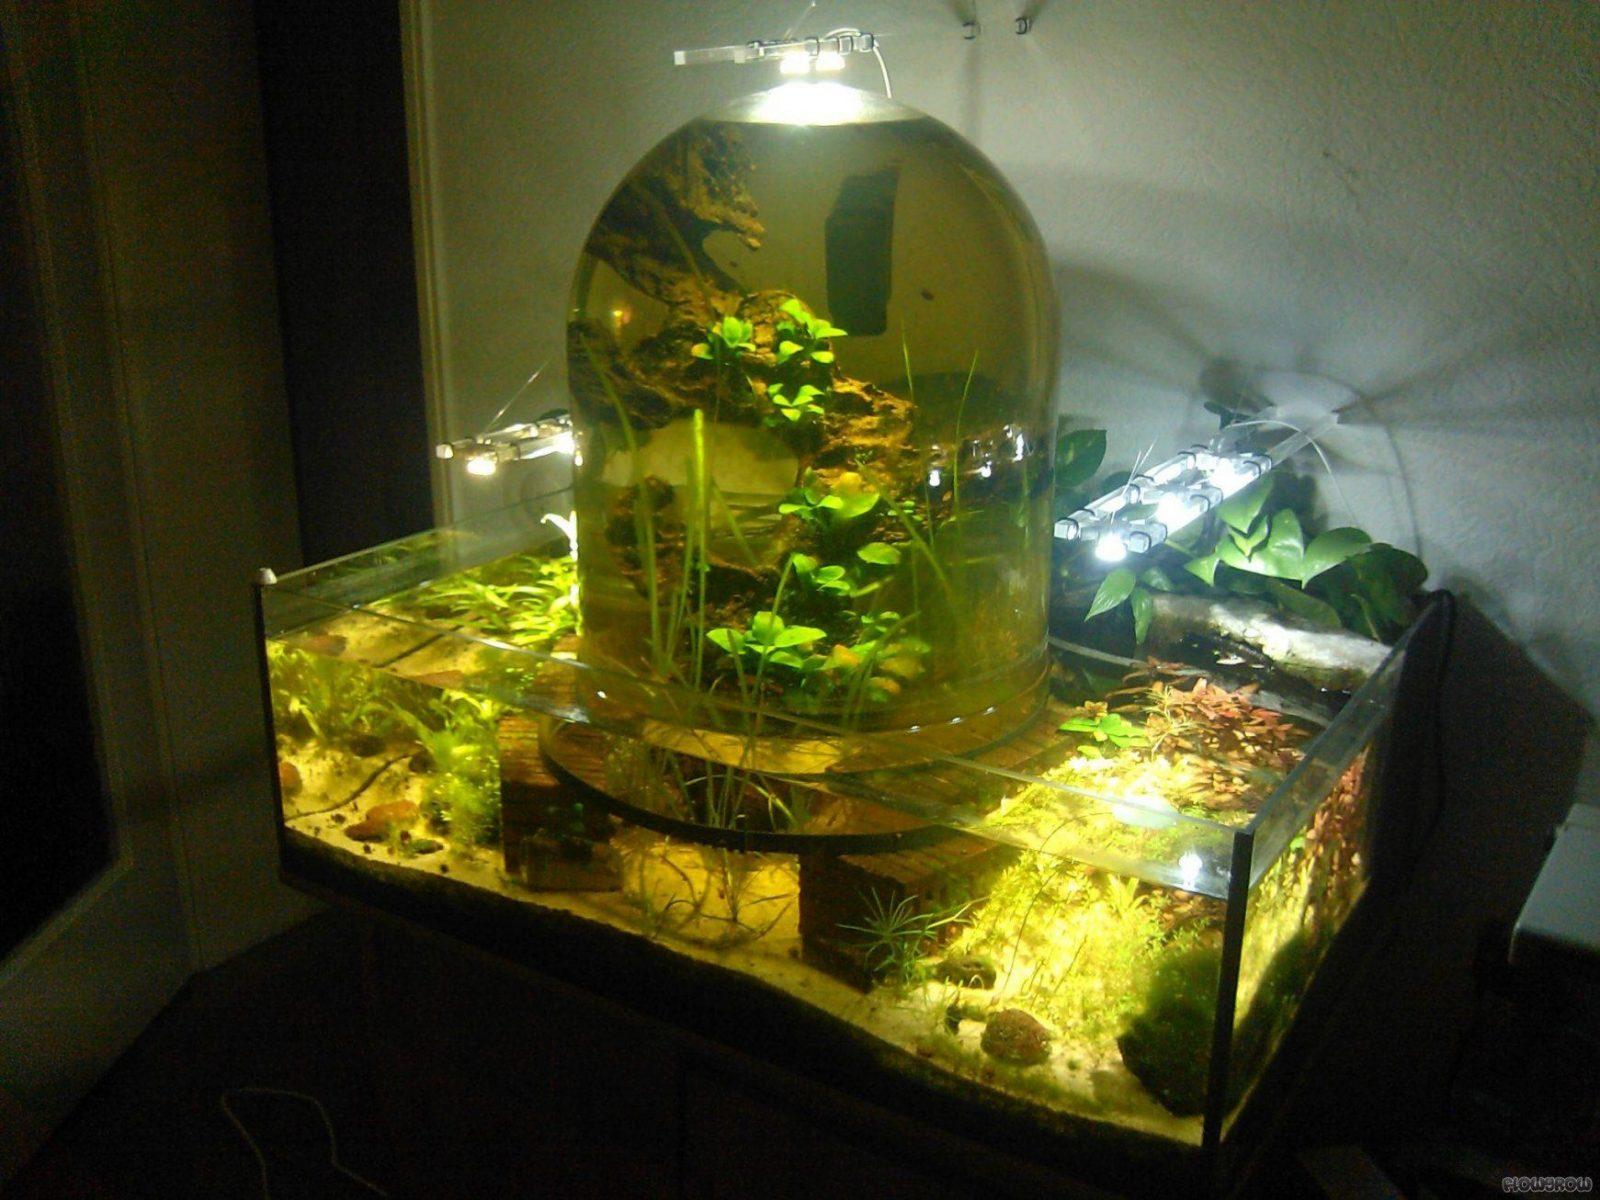 Led Grow Lampe Selber Bauen Led Grow Lampe Selber Bauen Einzigartig